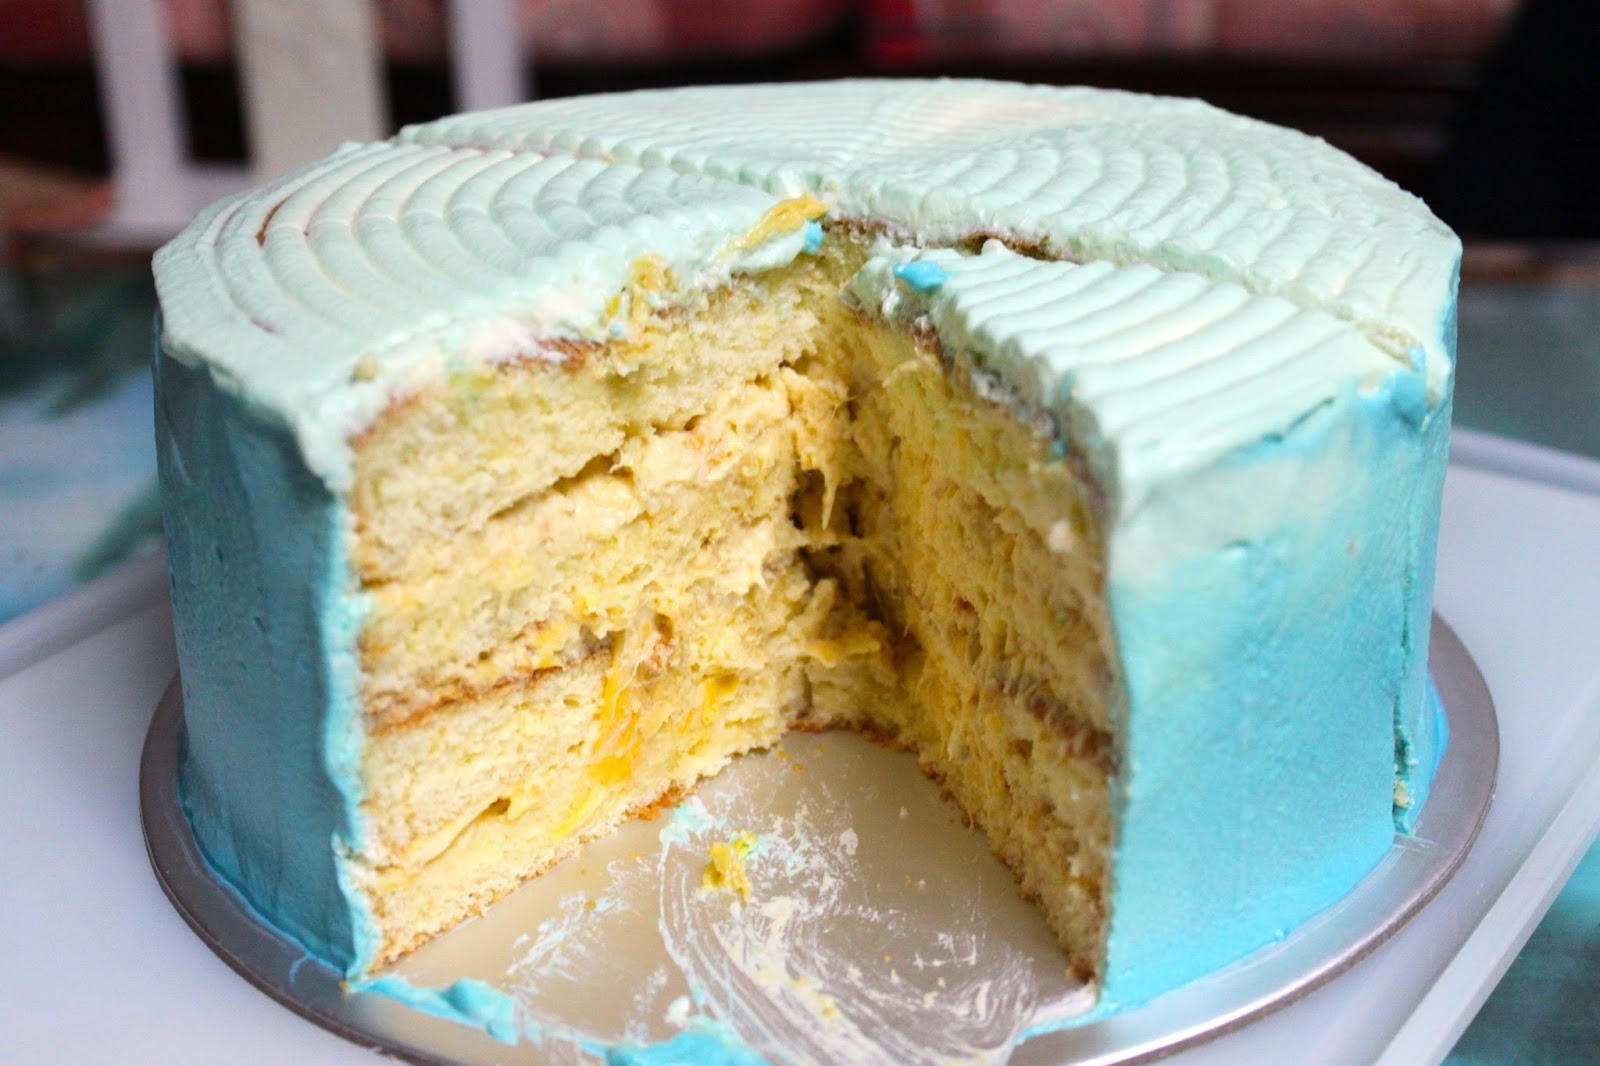 Yogilatte Durian Layered Cake Happy Birthday To My Pa Pa